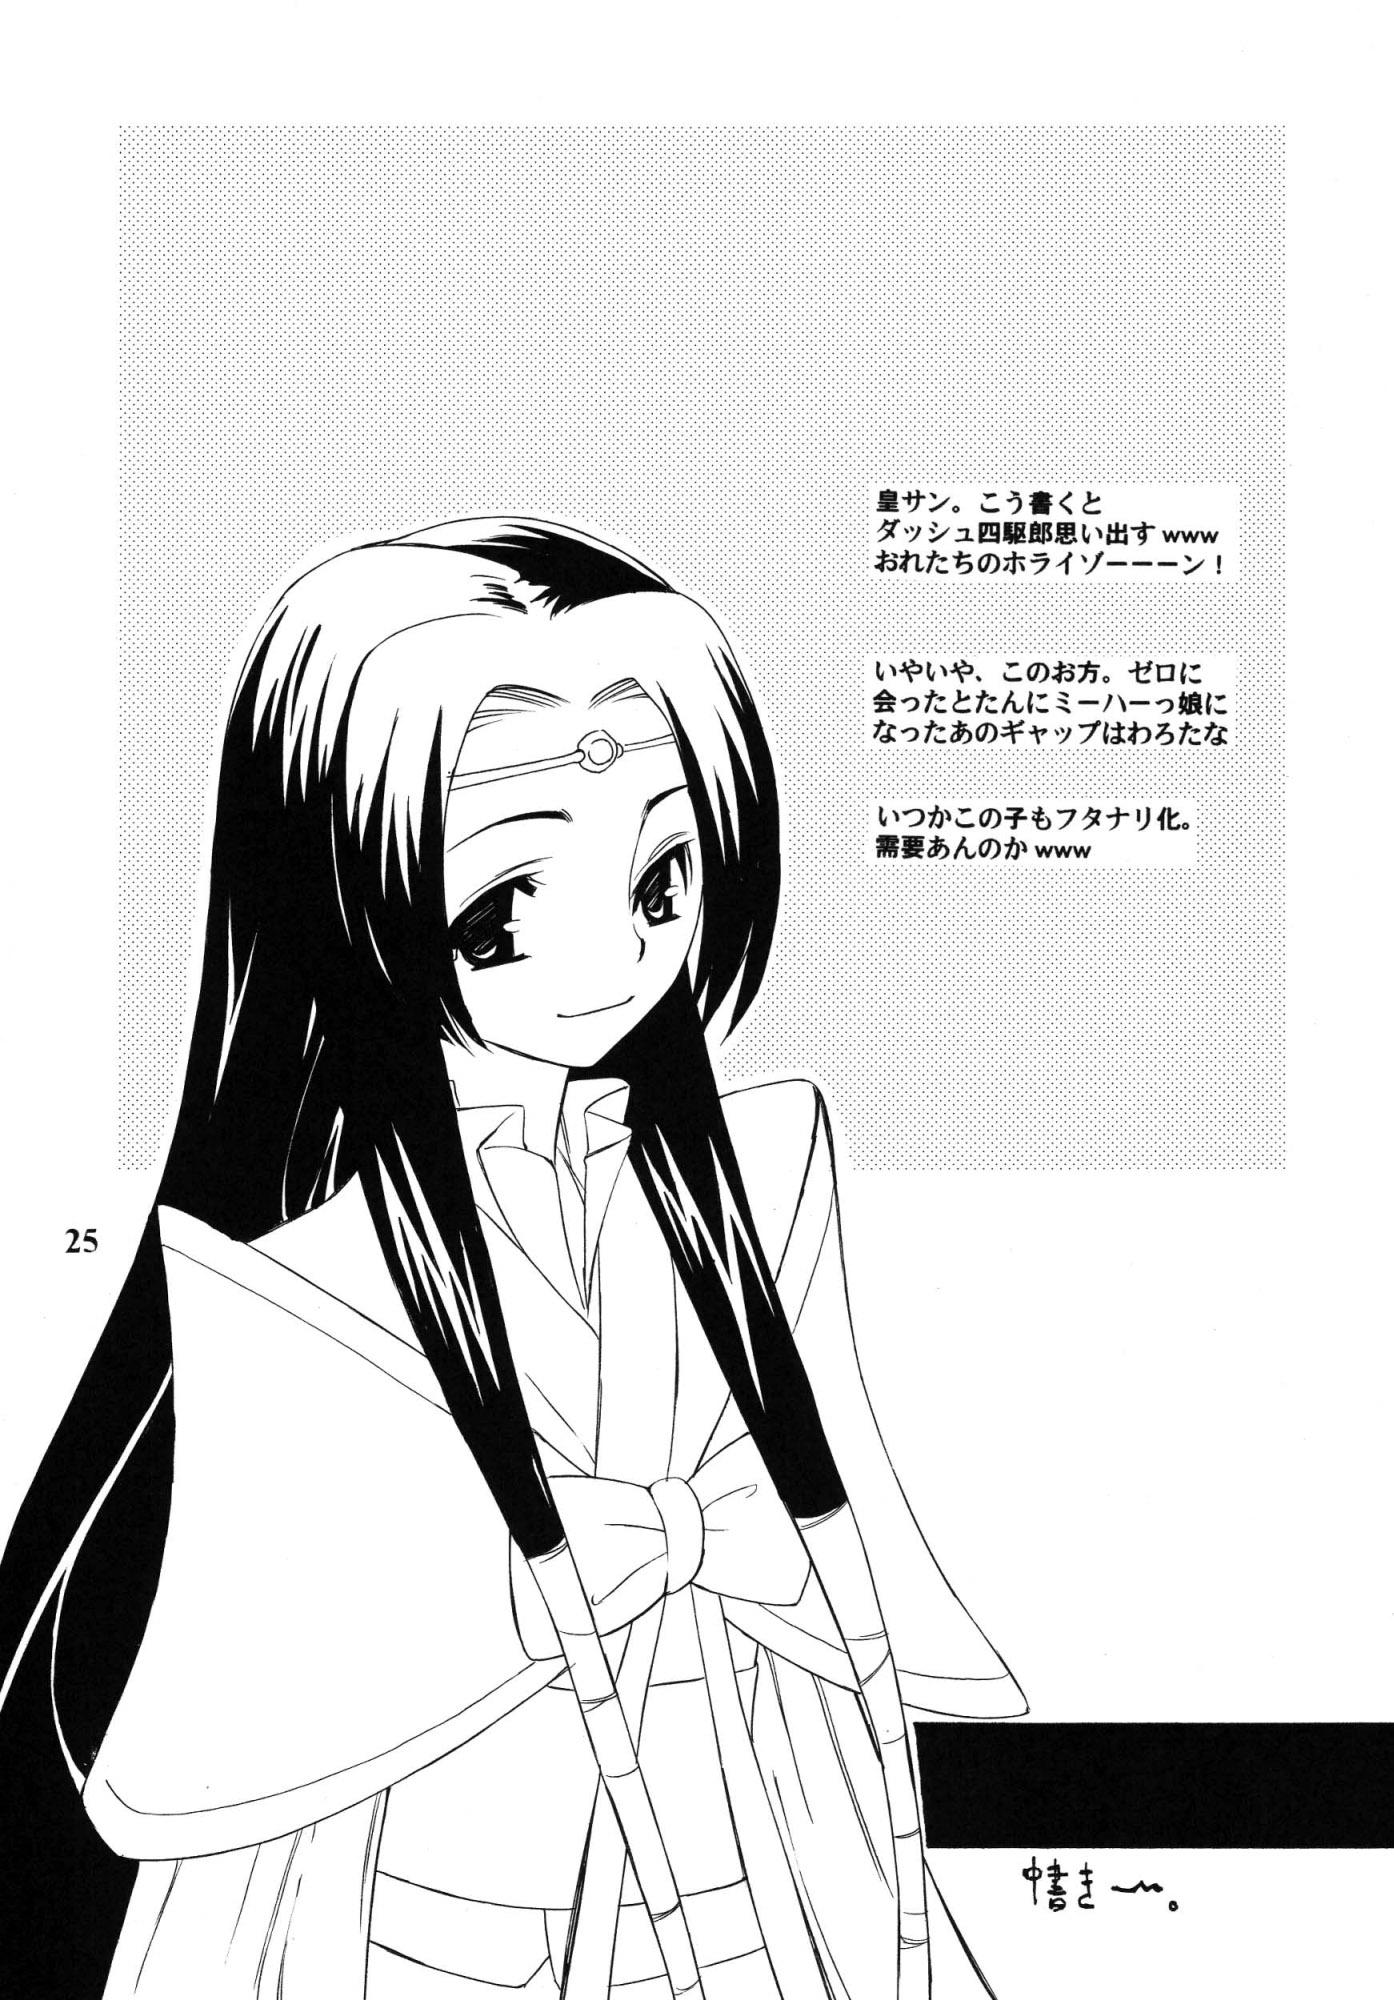 DoujinReader.com Nu!_page24